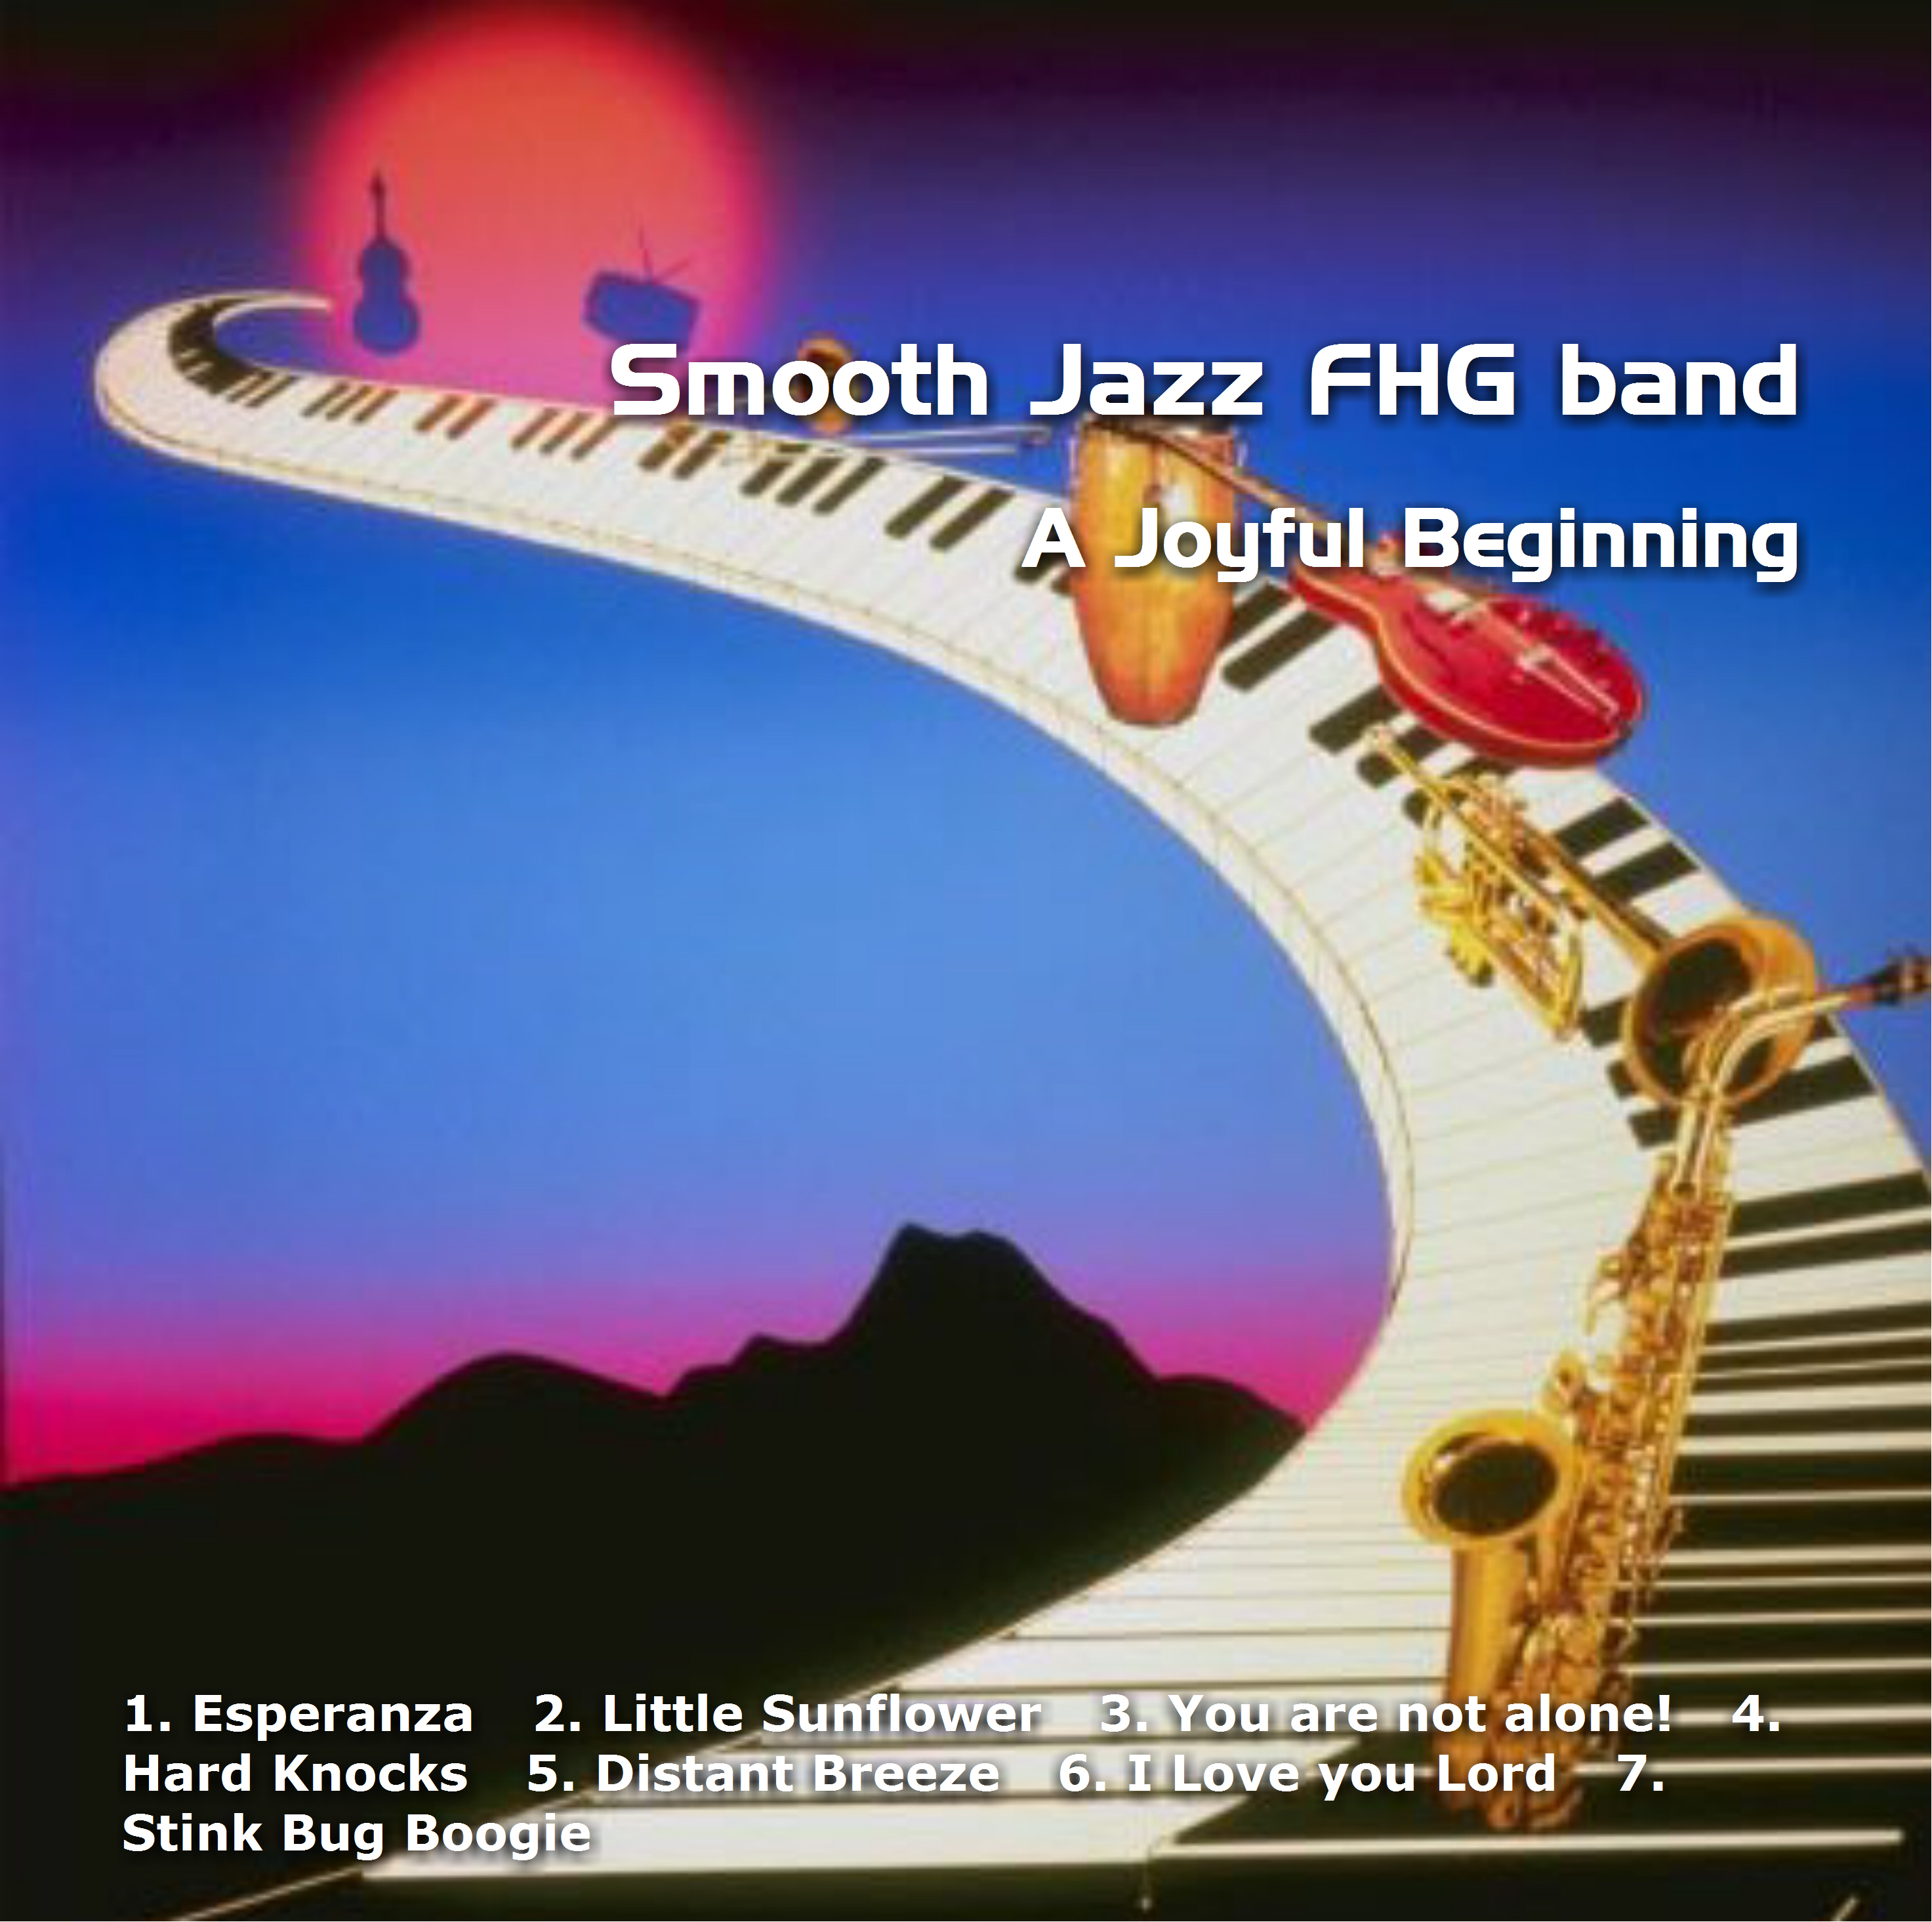 Smooth Jazz FHG Band